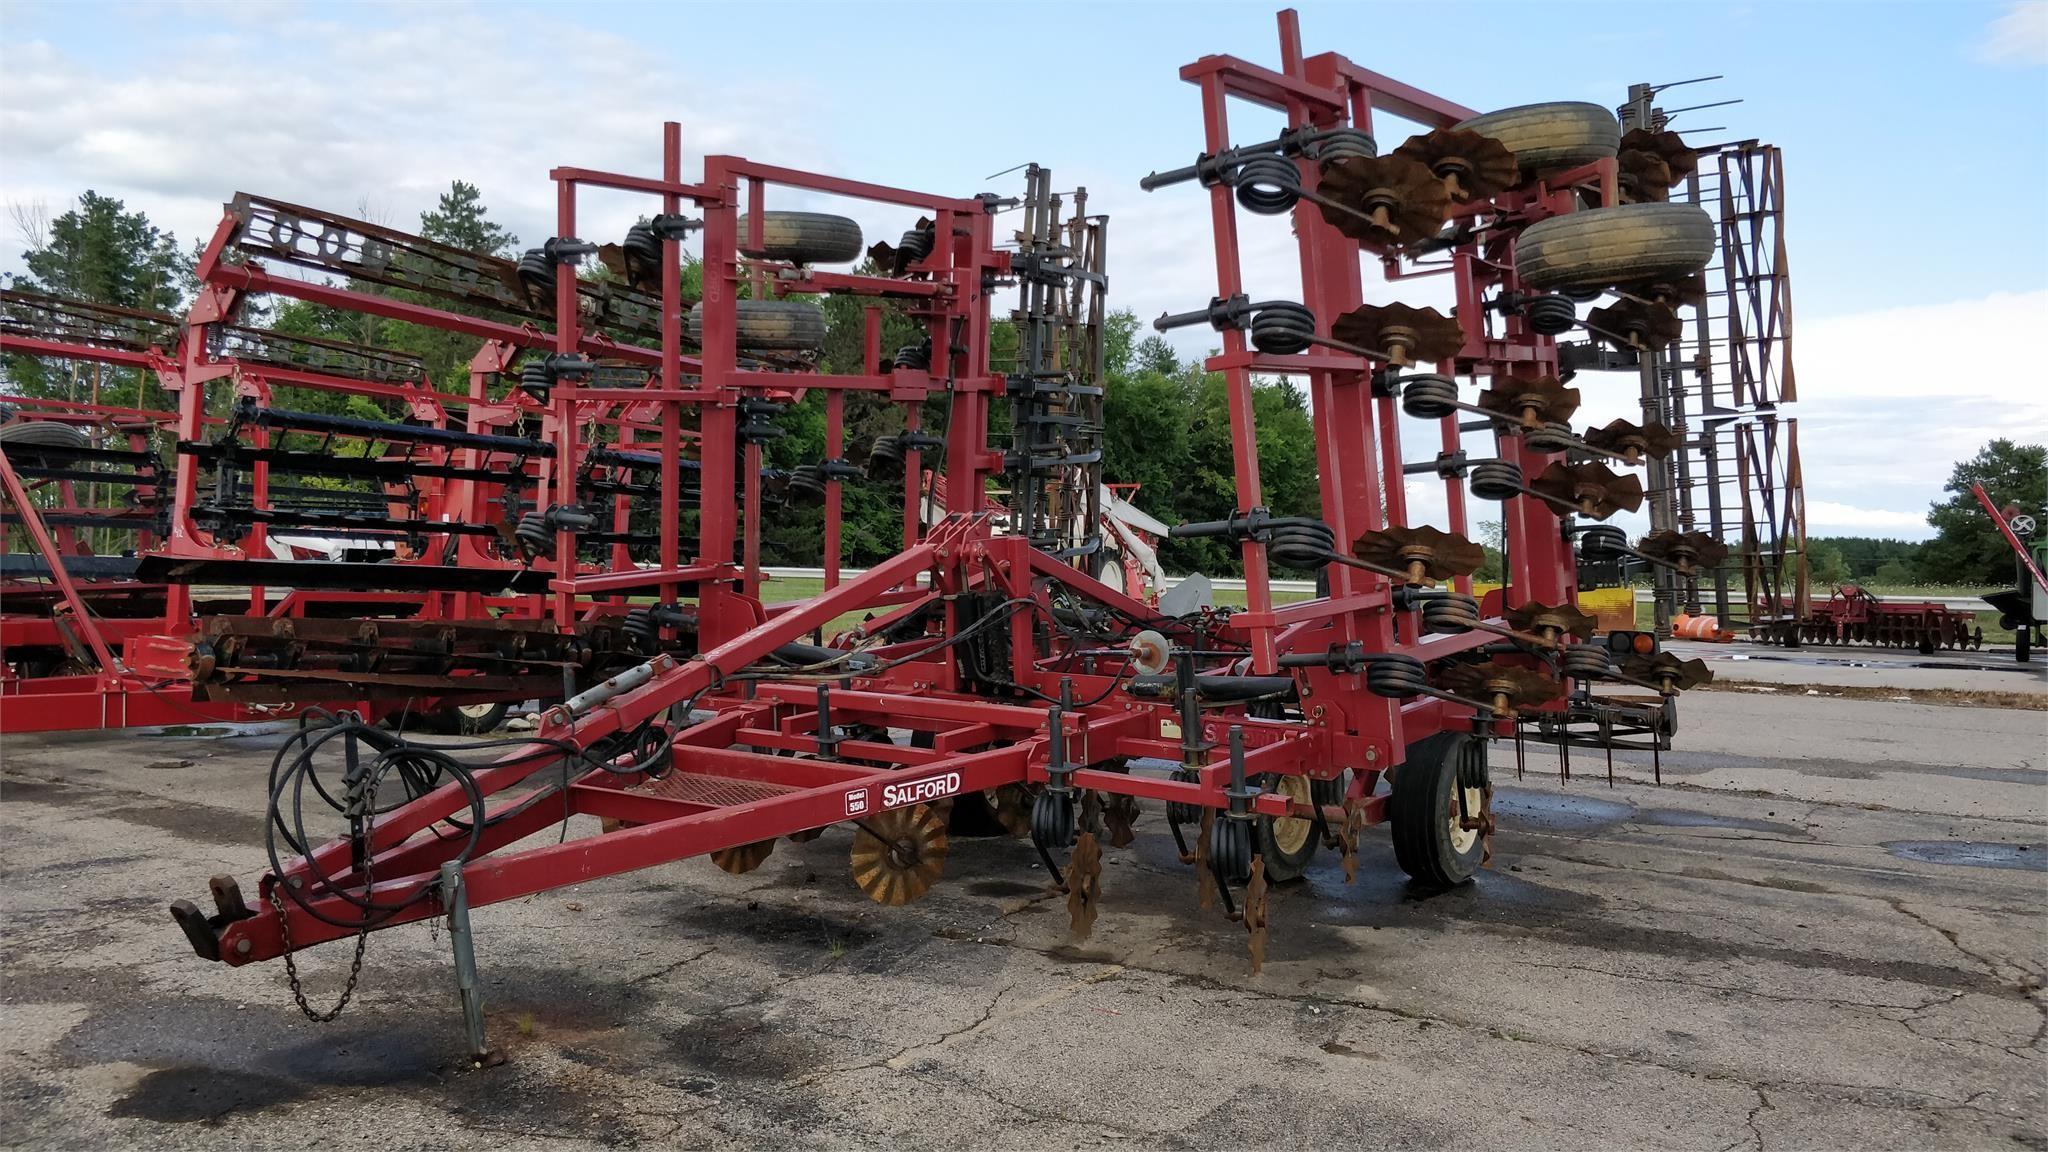 Salford 550 Field Cultivator